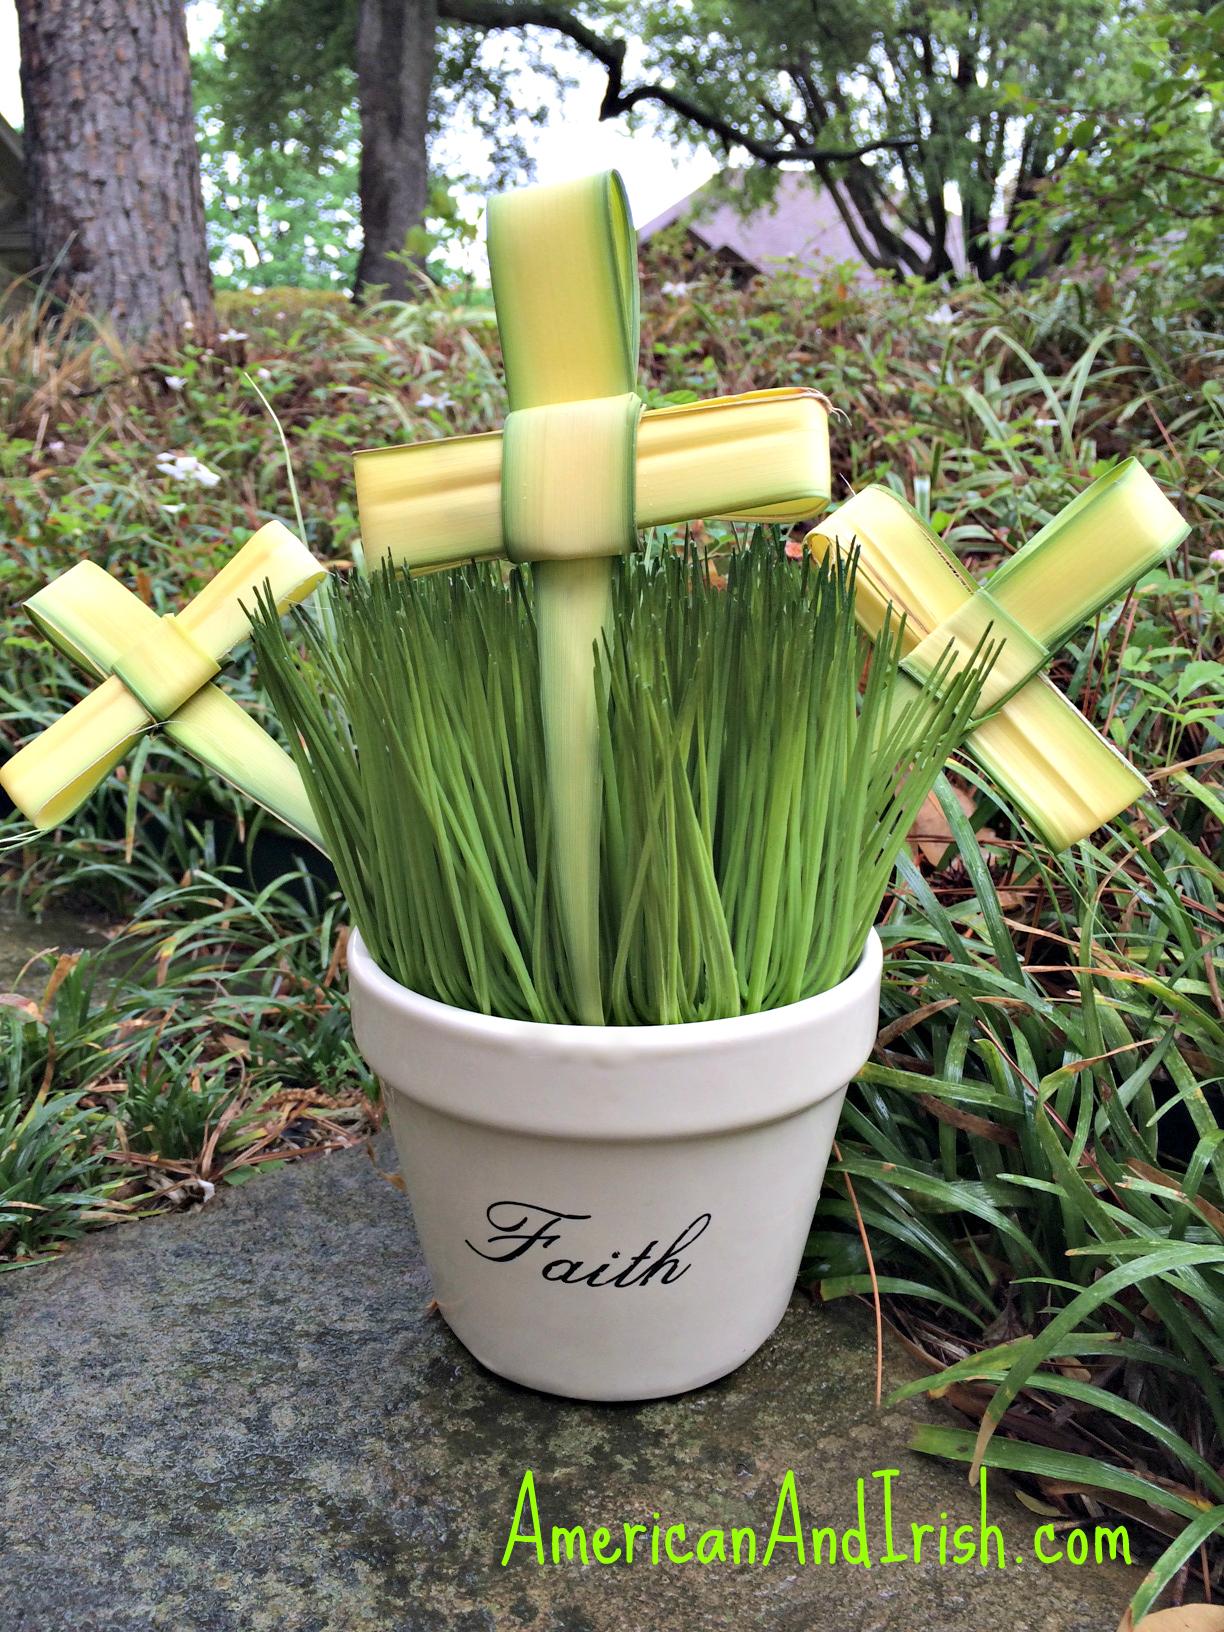 Folding Palm Sunday Crosses